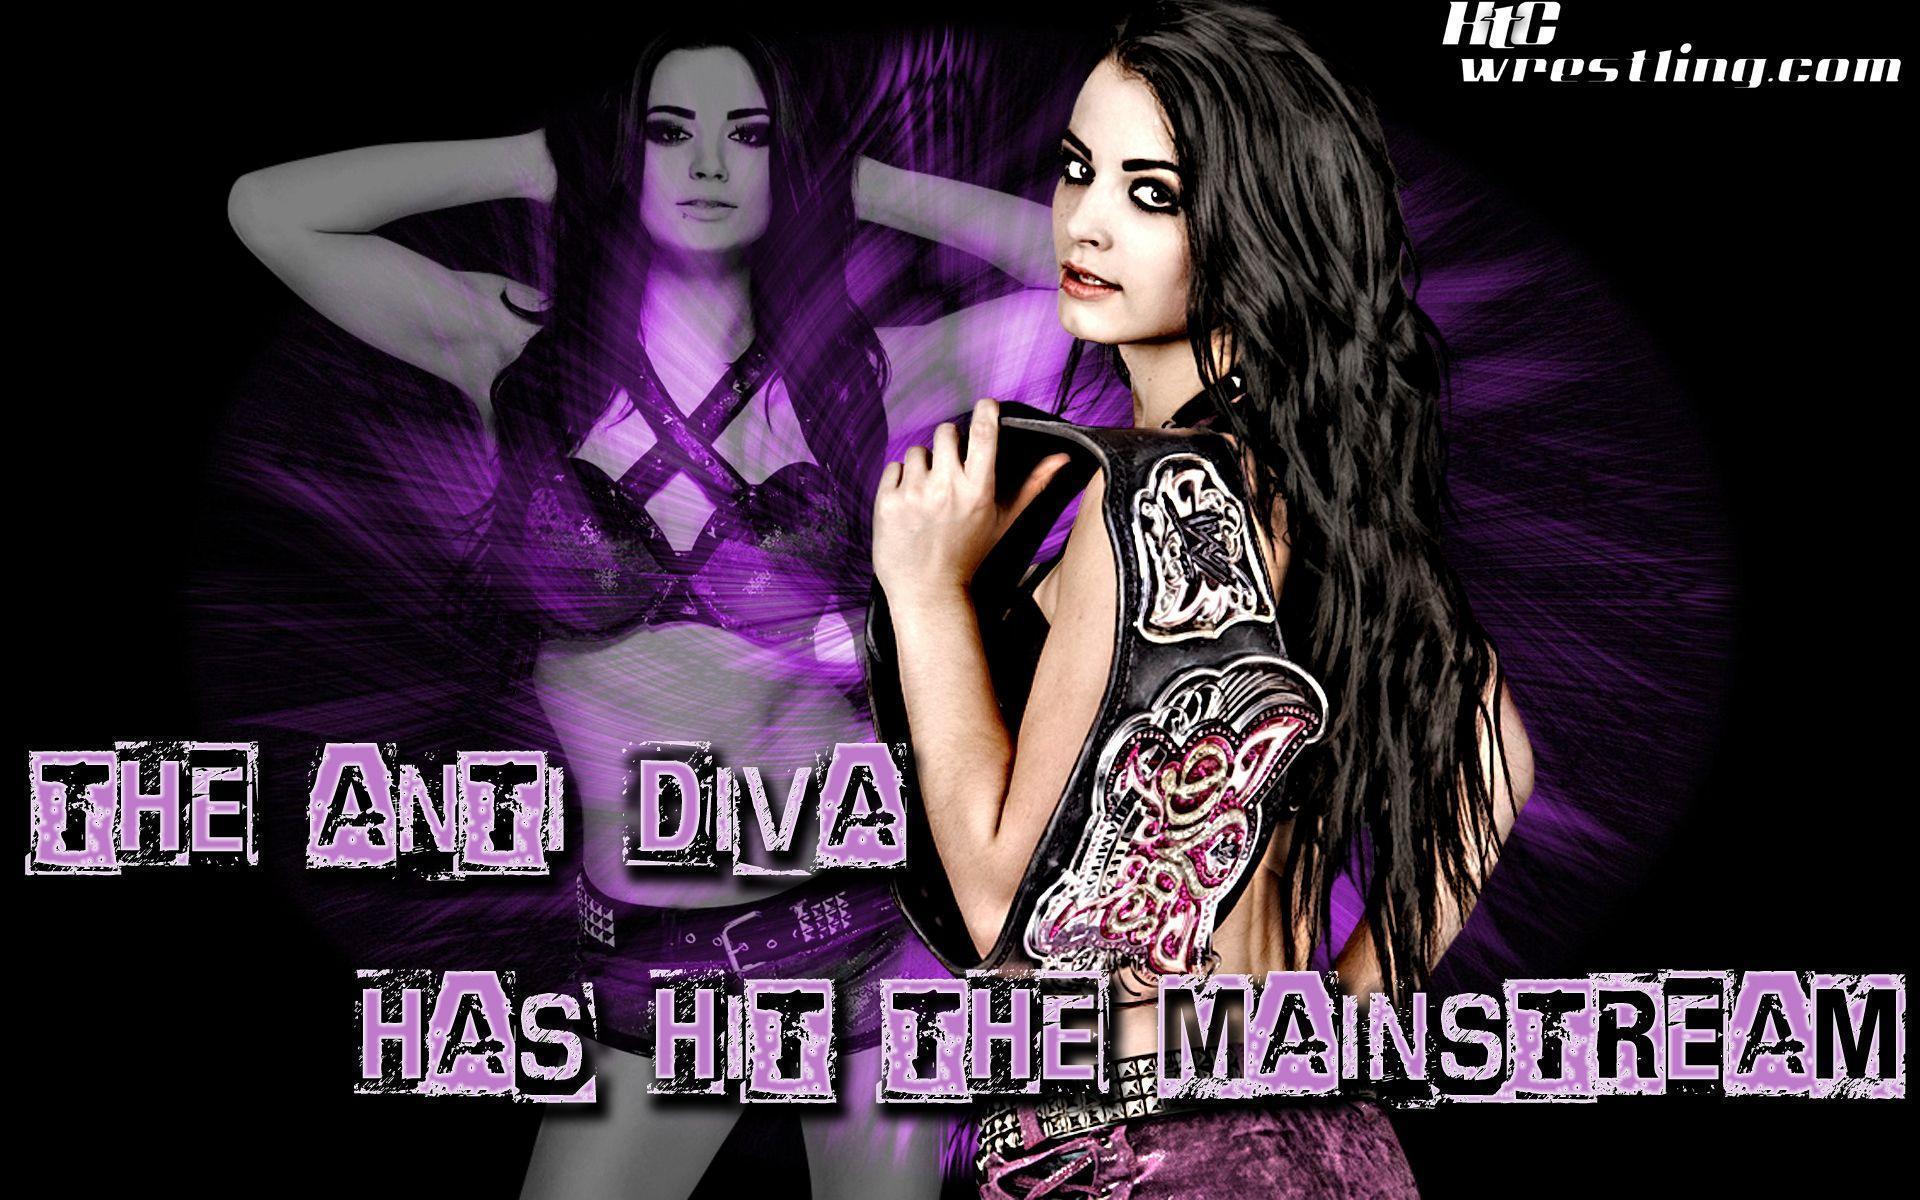 Paige wwe wallpapers wallpaper cave - Diva wallpaper ...